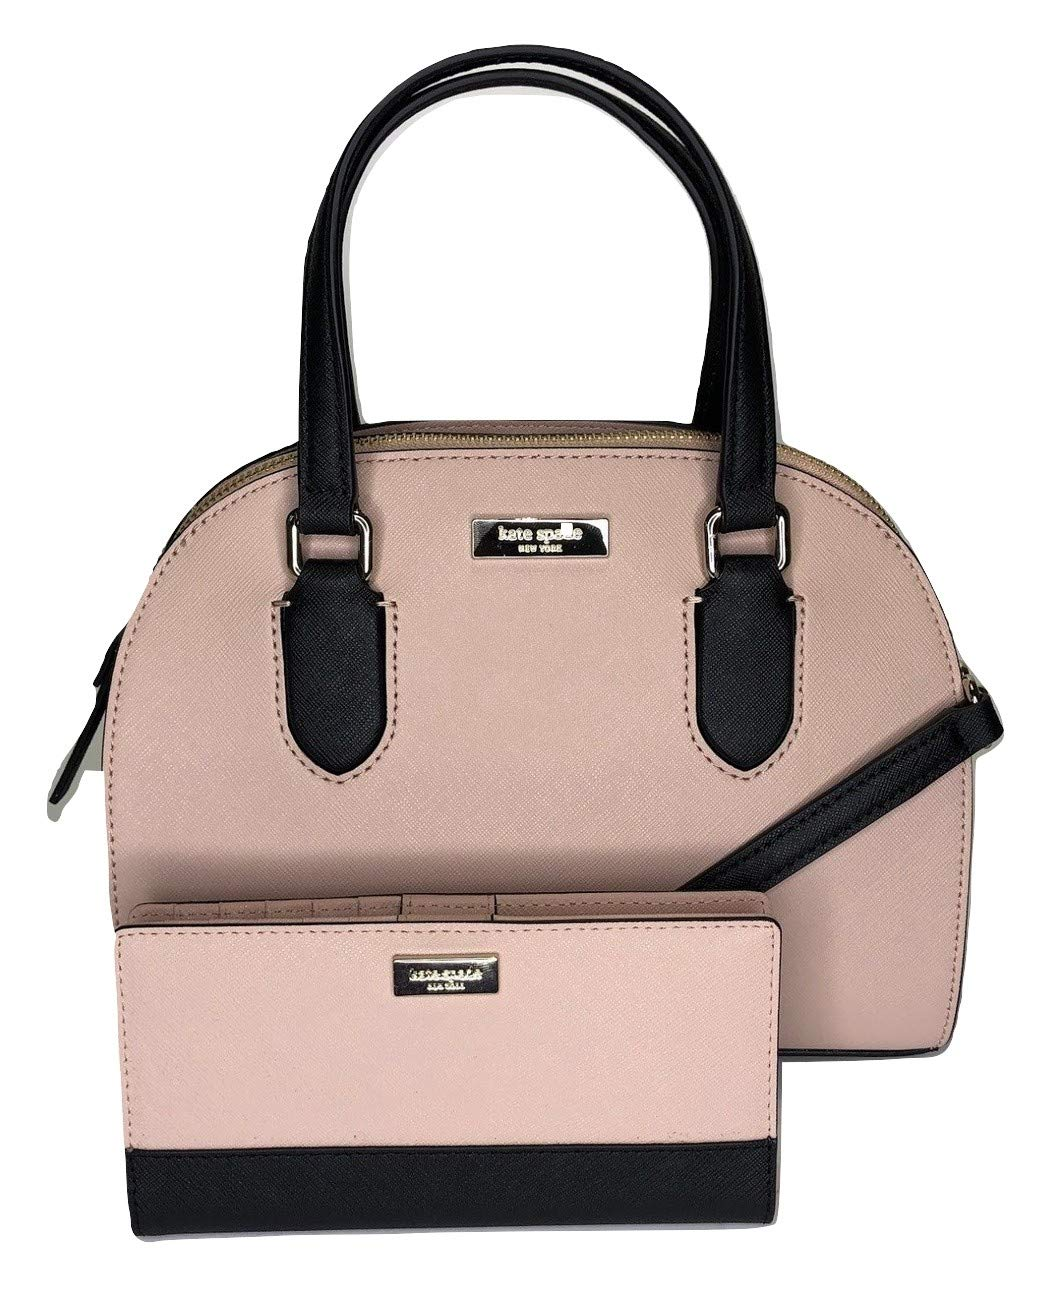 Kate Spade New York Laurel Way Mini Reiley WKRU5639 bundled with matching Stacy Wallet (Warm Vellum/Black)